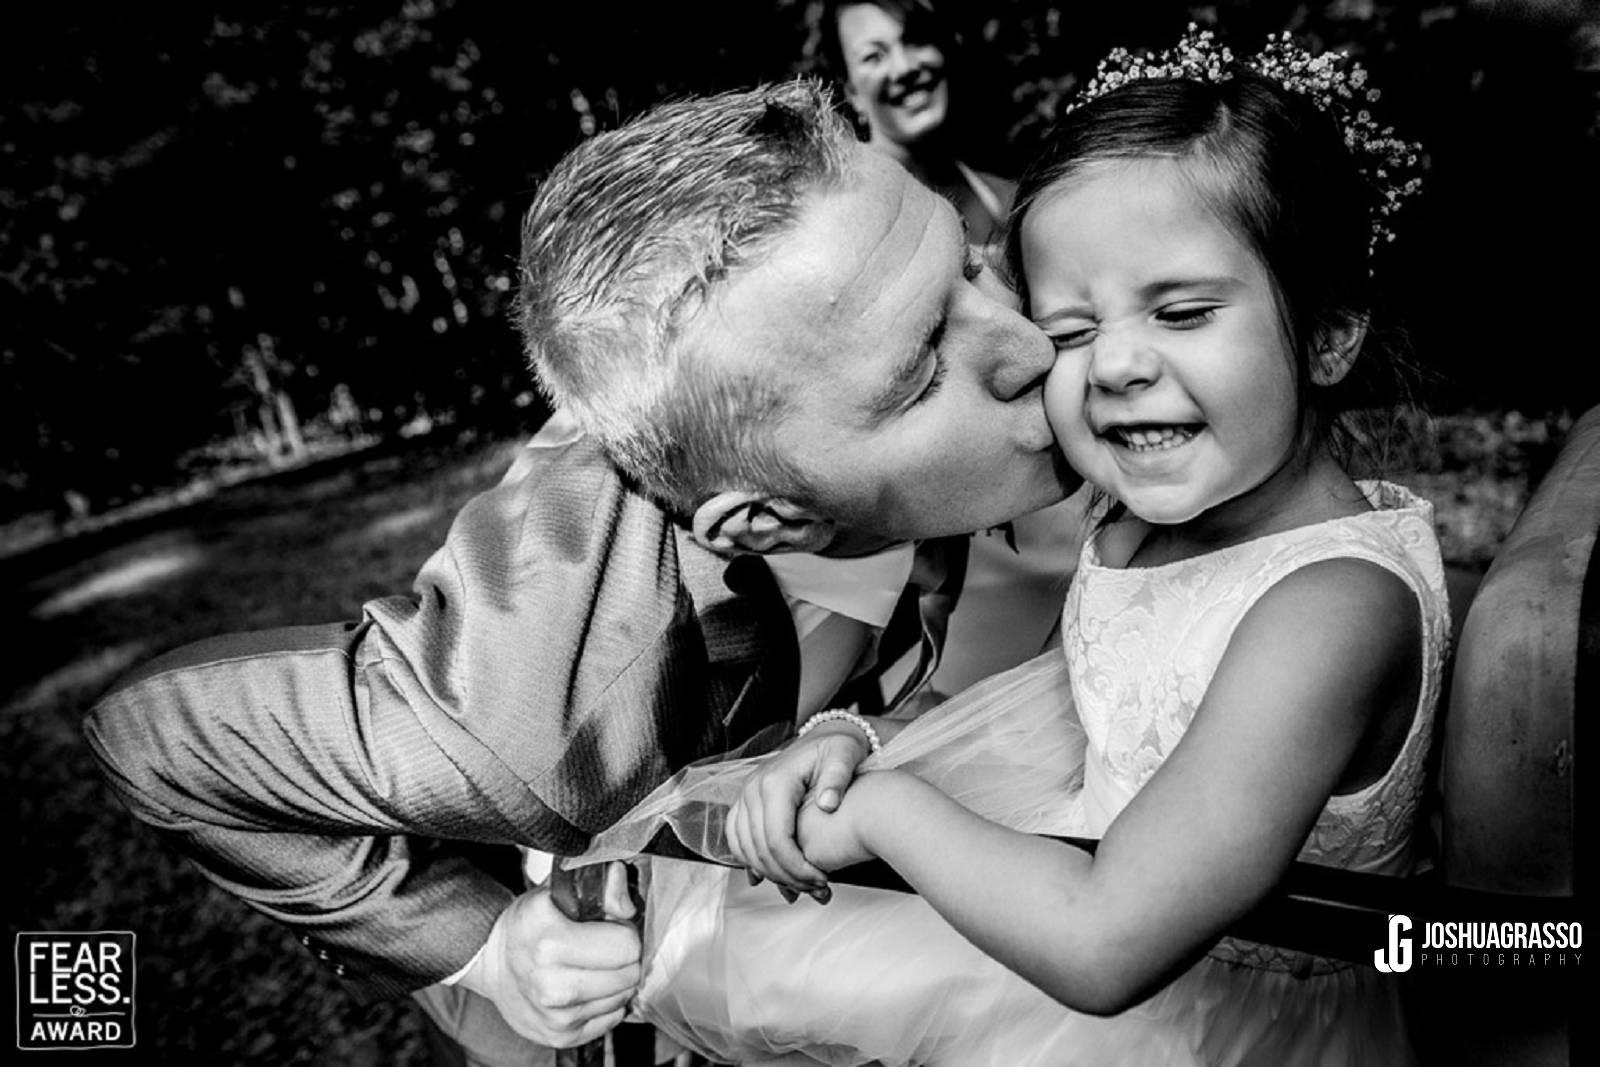 Wedding Photography, Atlanta Ga | Joshua Grasso Wedding